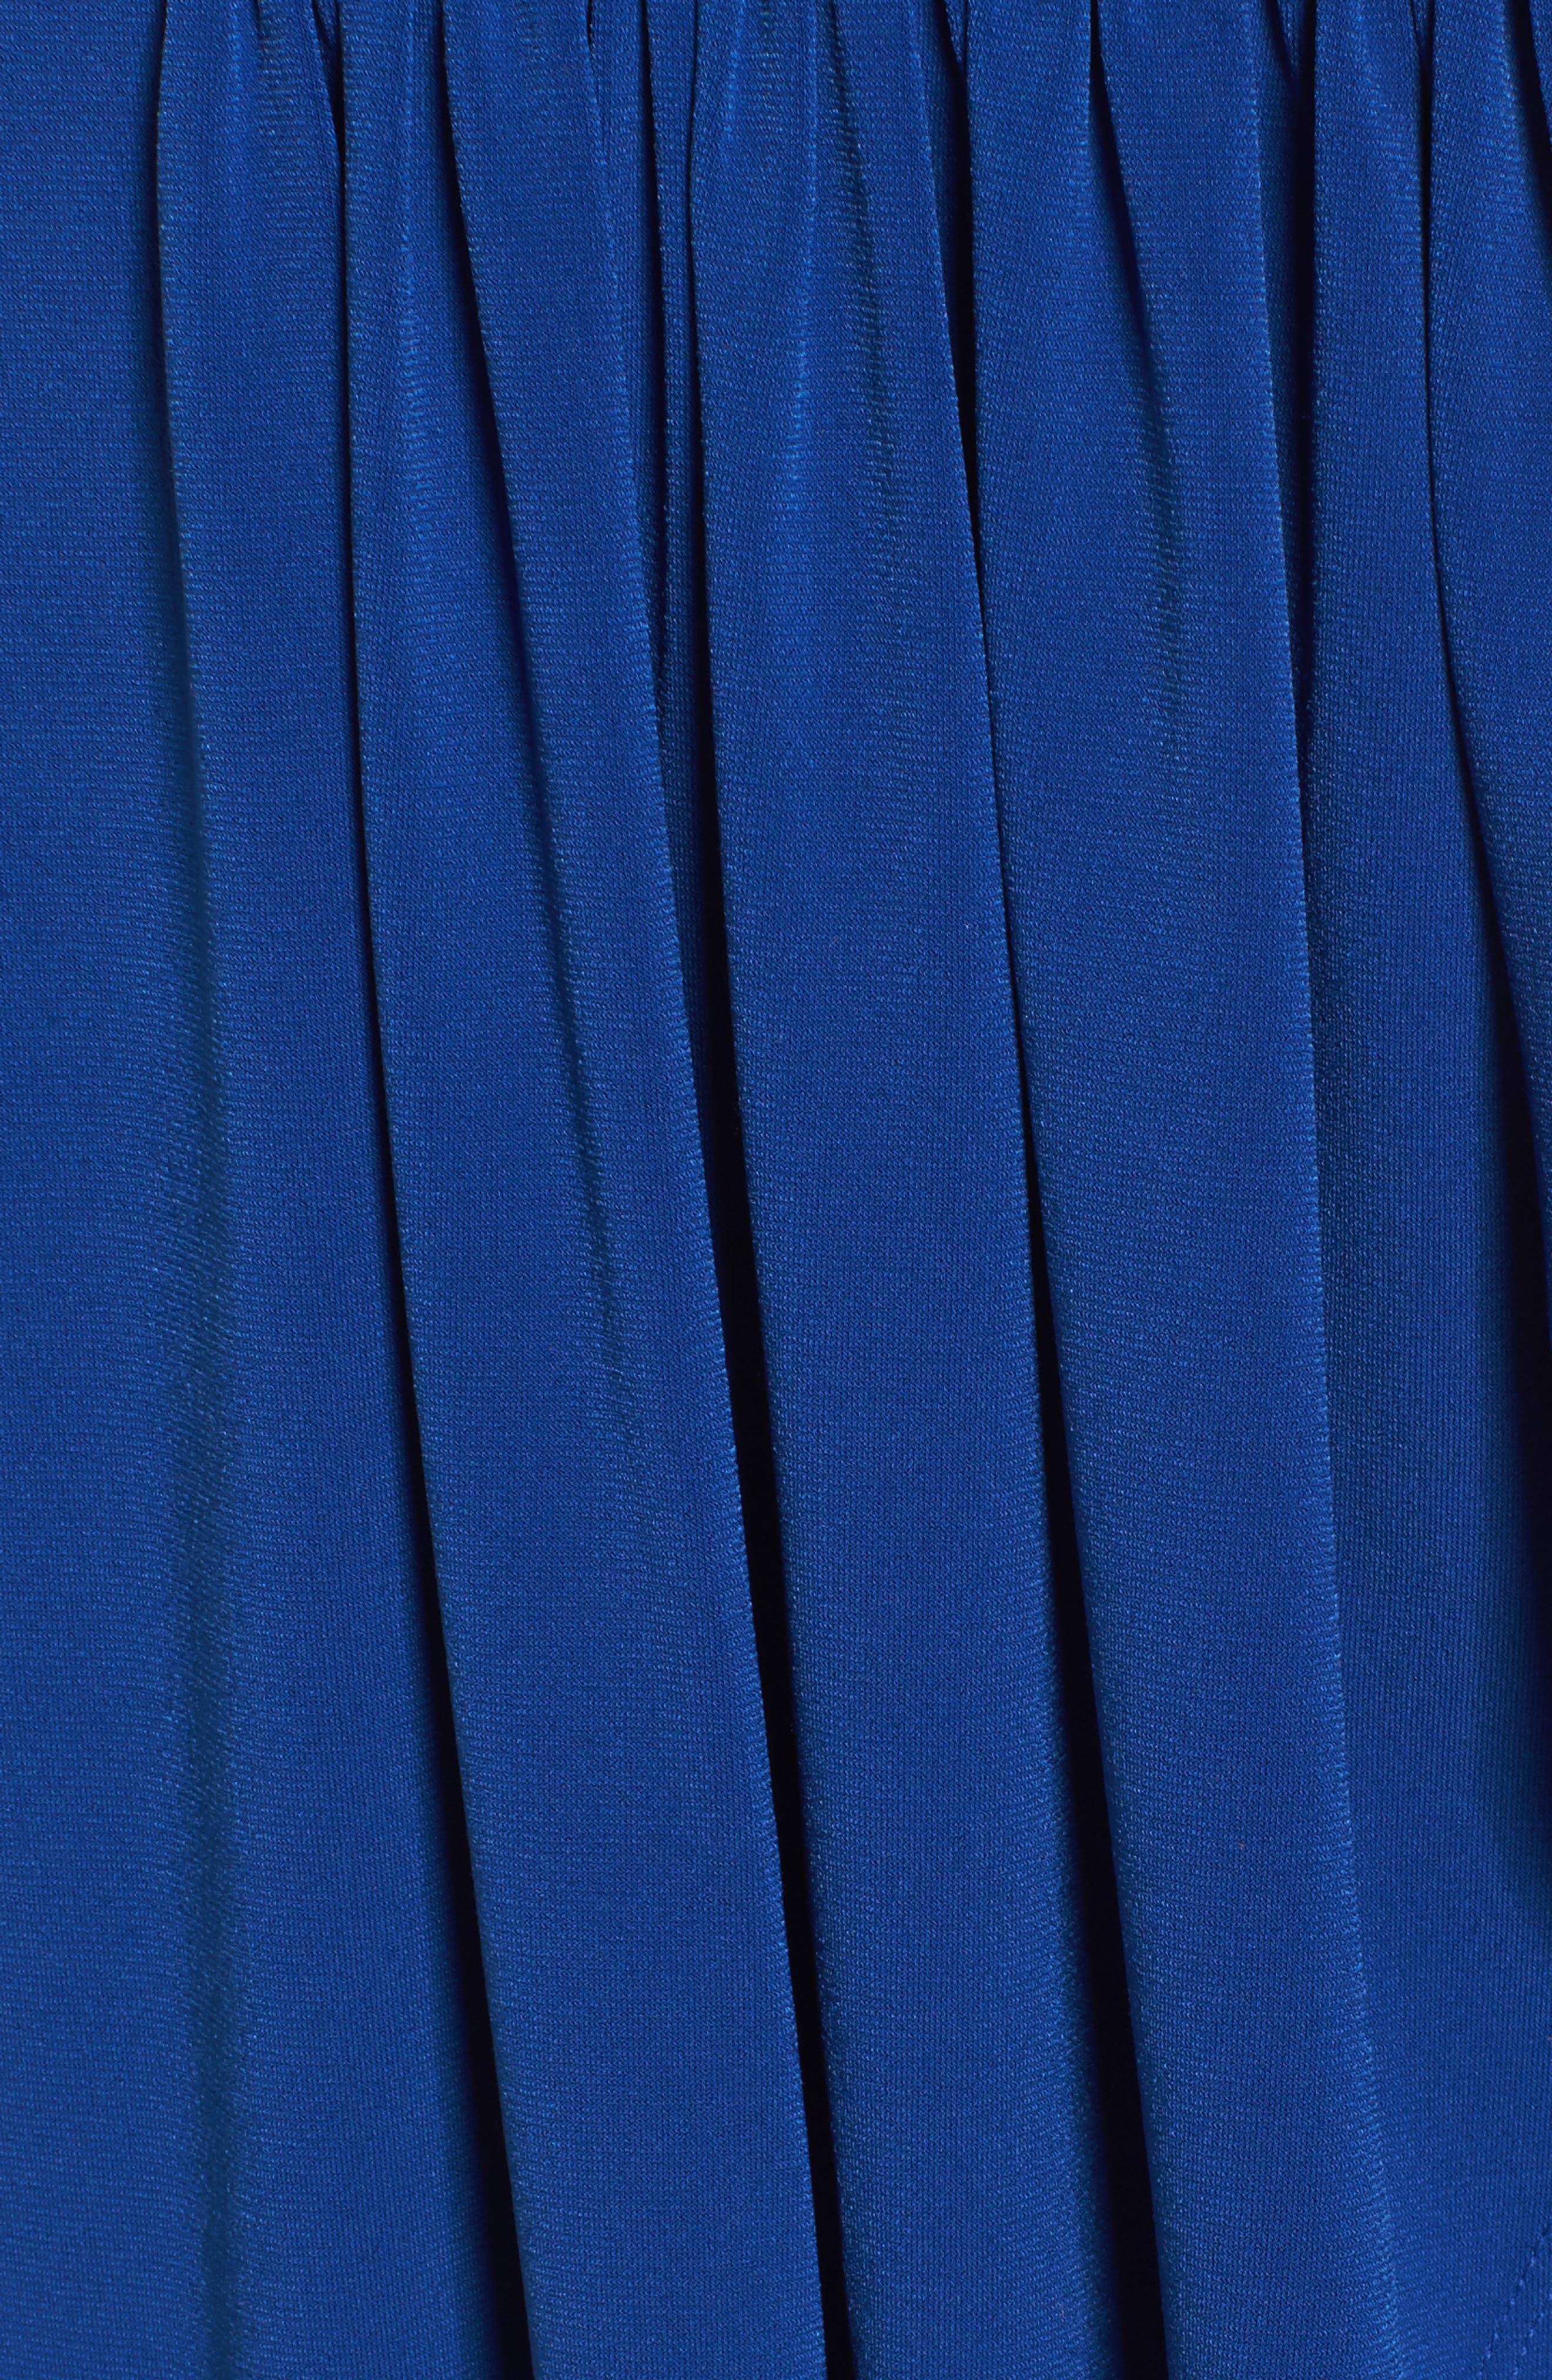 Elenna Stretch Jersey Sundress,                             Alternate thumbnail 5, color,                             DARK BLUE